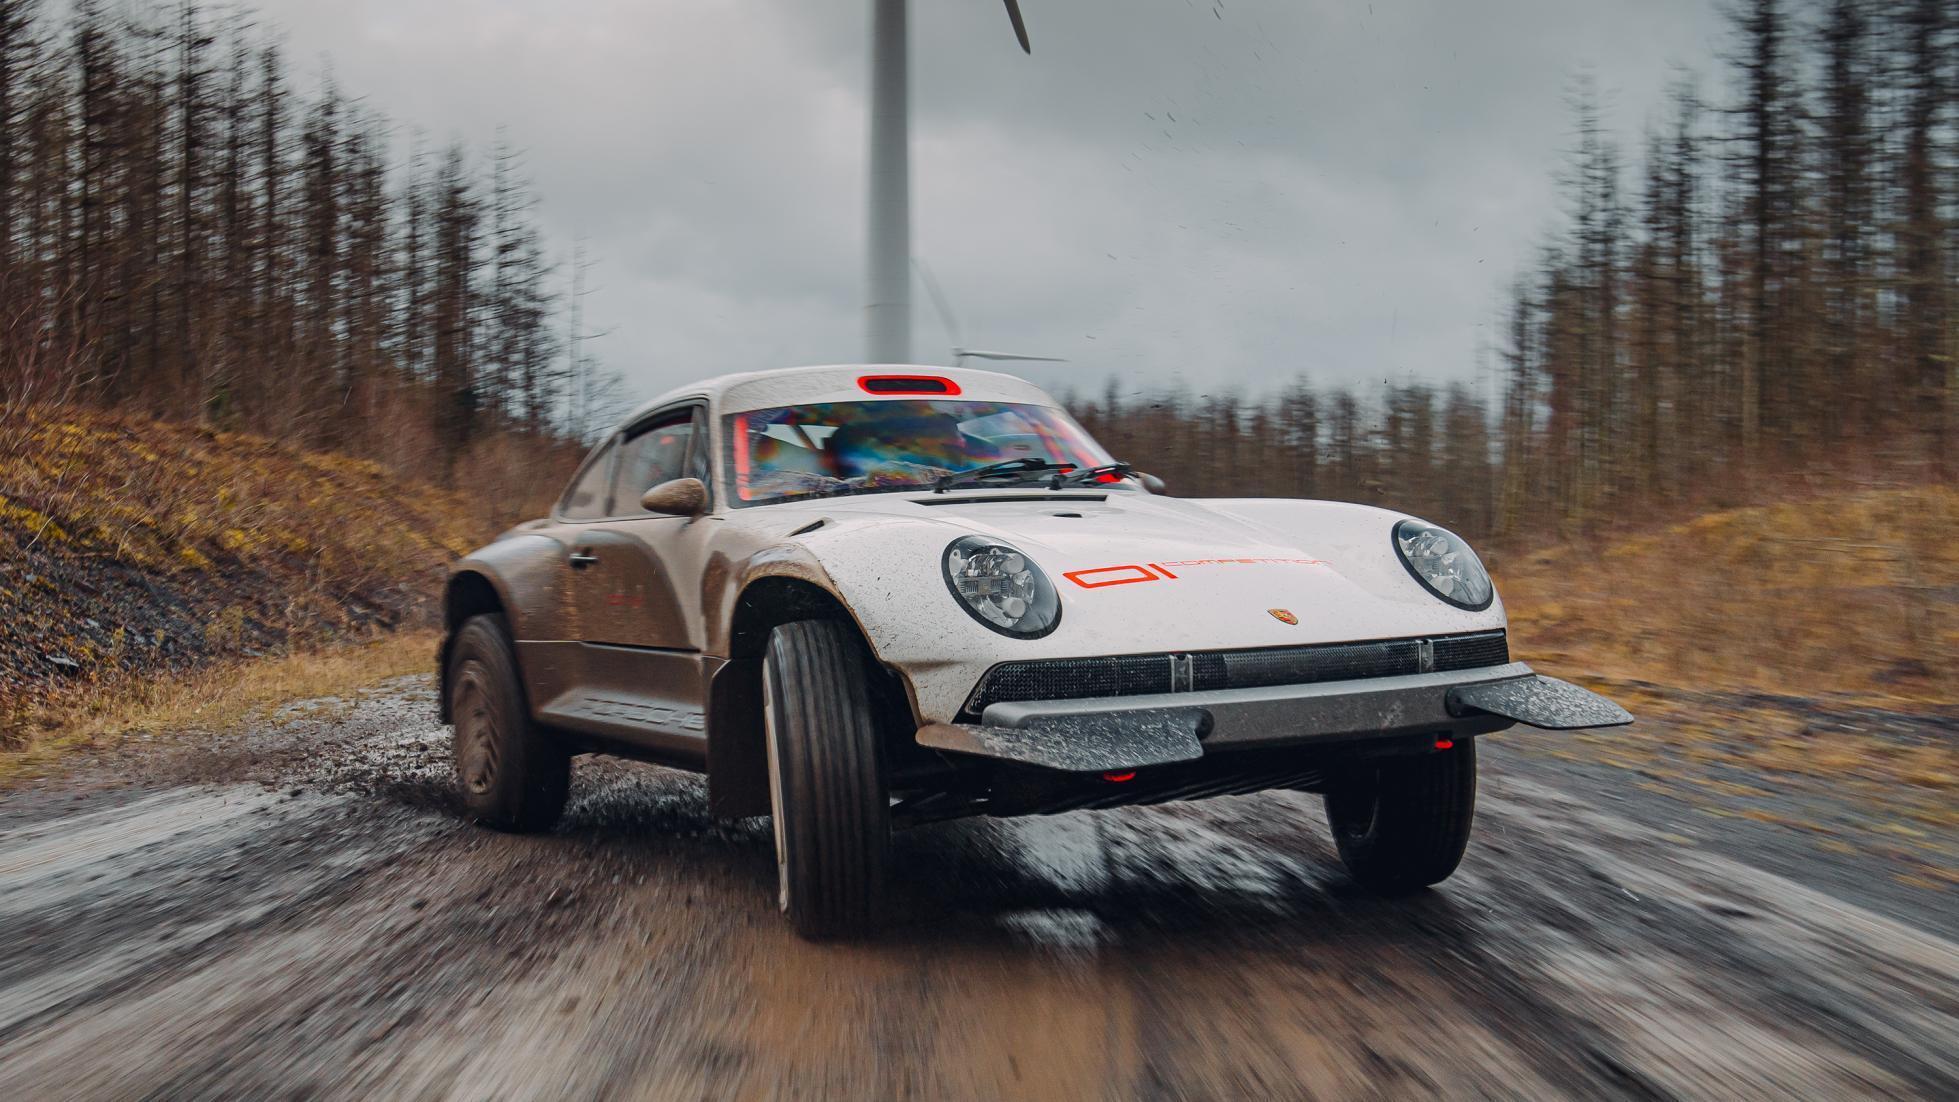 За основу було взято купе Porsche 911 1990 року випуску